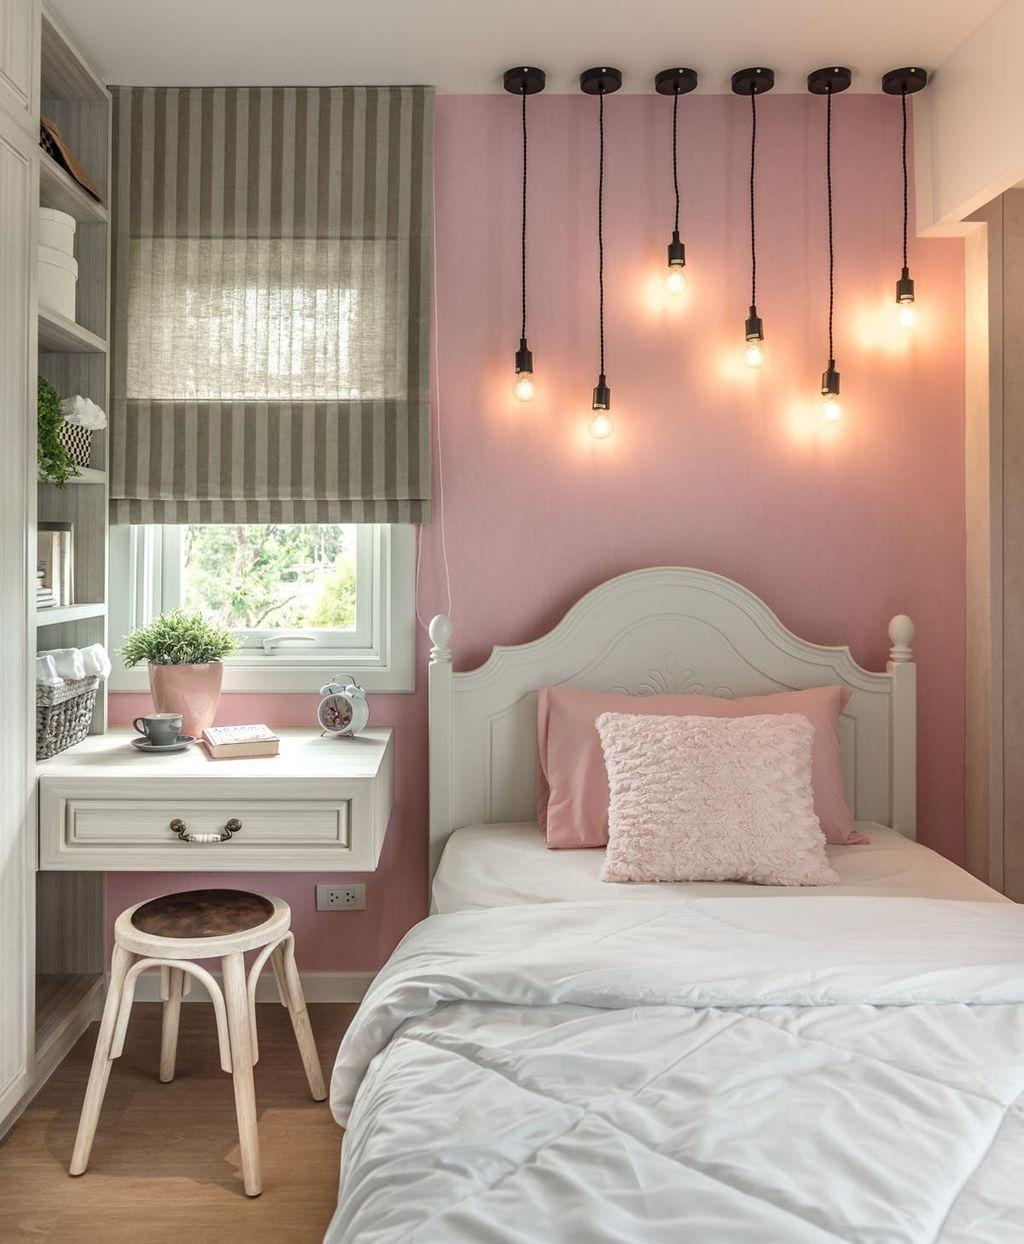 30+ Elegant Decorating Ideas For Small Girl Bedrooms ... on Small Bedroom Ideas For Teenage Girl  id=28482